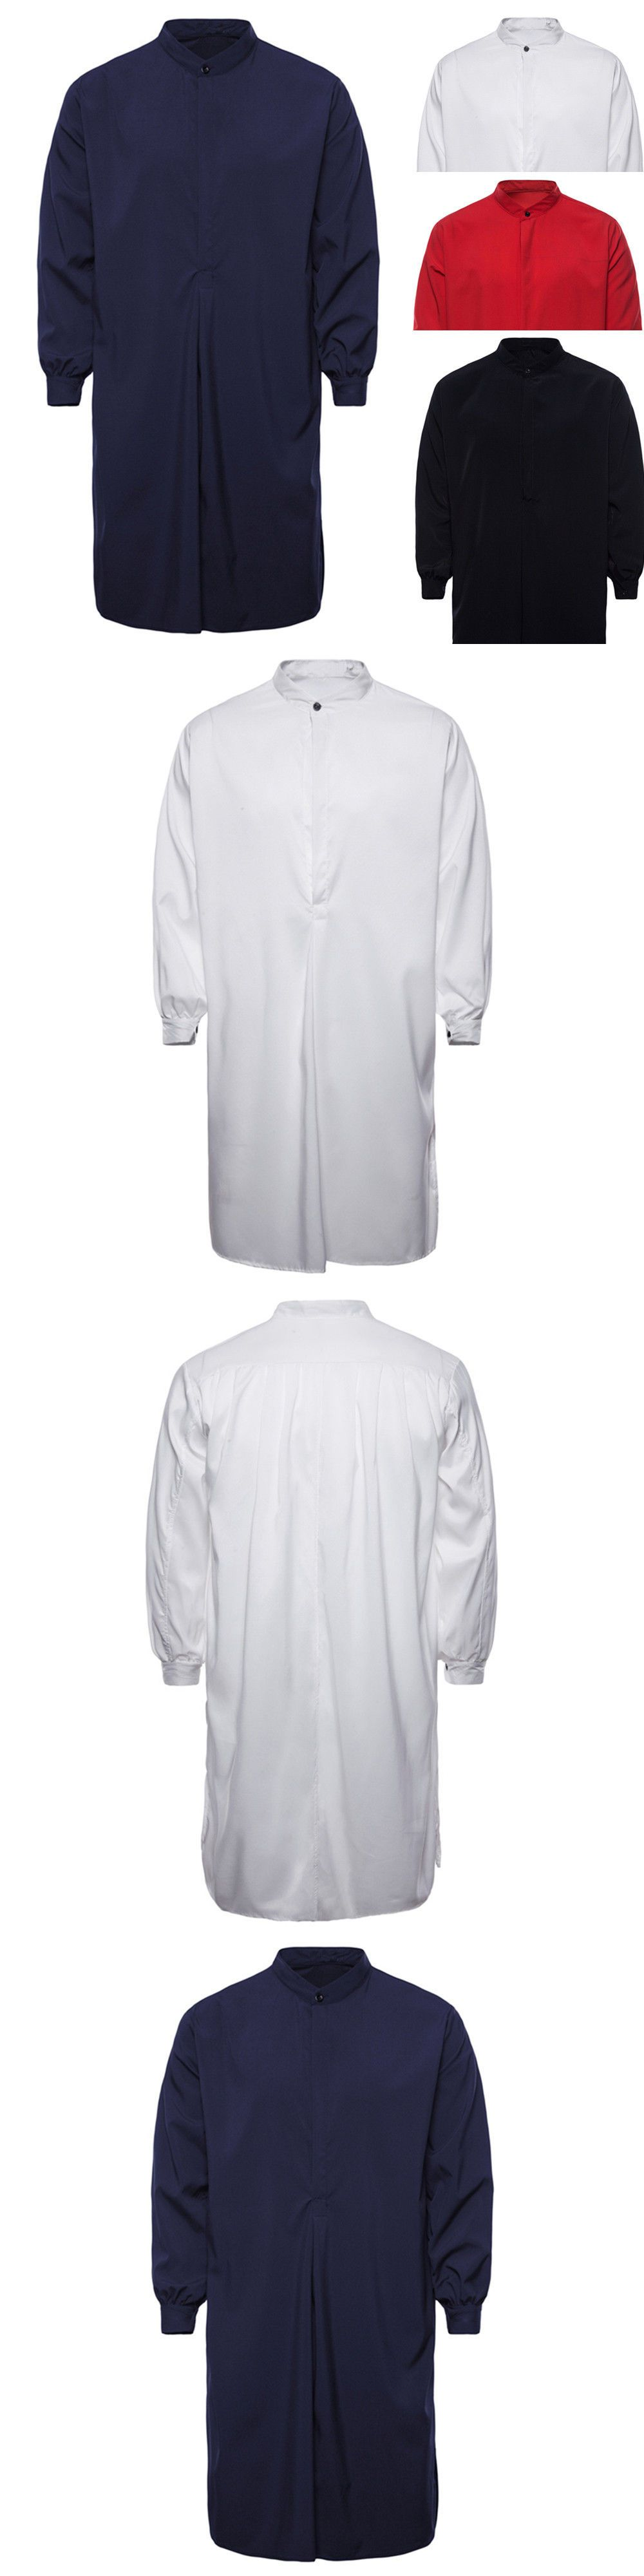 Middle East 155253 Men S Autumn Solid Muslim Thobe Islamic Arabic Baju Koko Bordir Sandi Clothing Long Sleeve Shirt